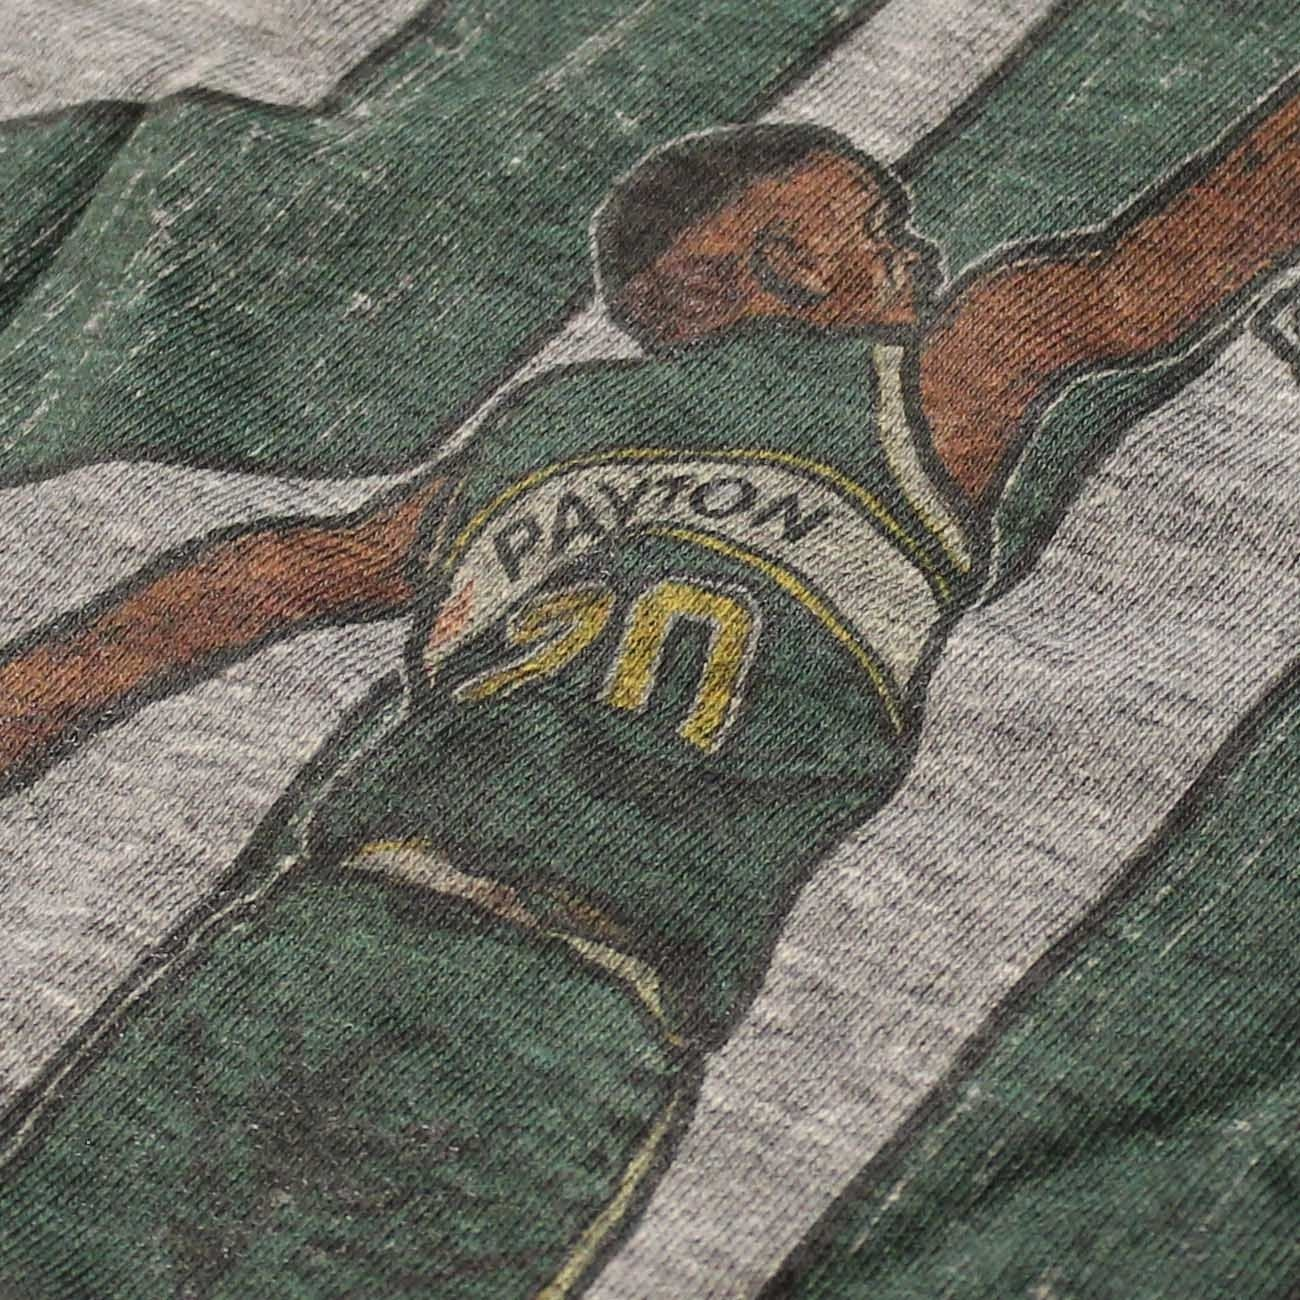 500 nivel Seattle Supersonics Gary Payton NBA camiseta gris: Amazon.es: Deportes y aire libre